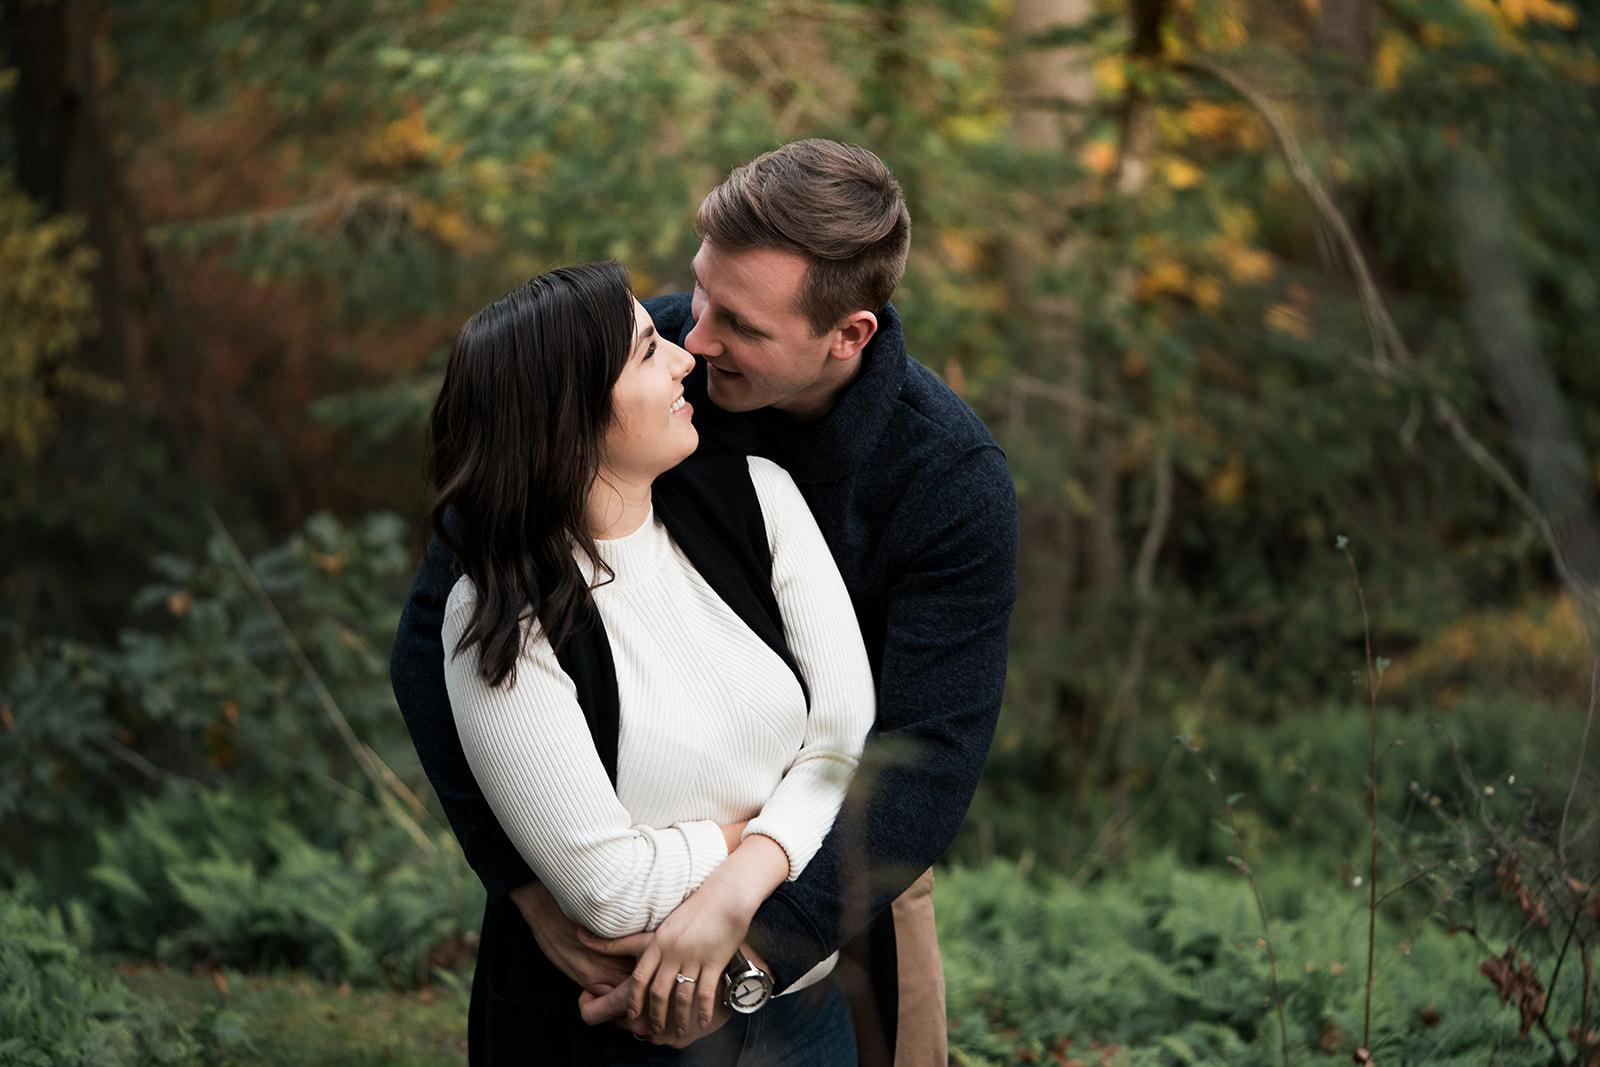 man-hugging-woman-connection-love-ebony-logins